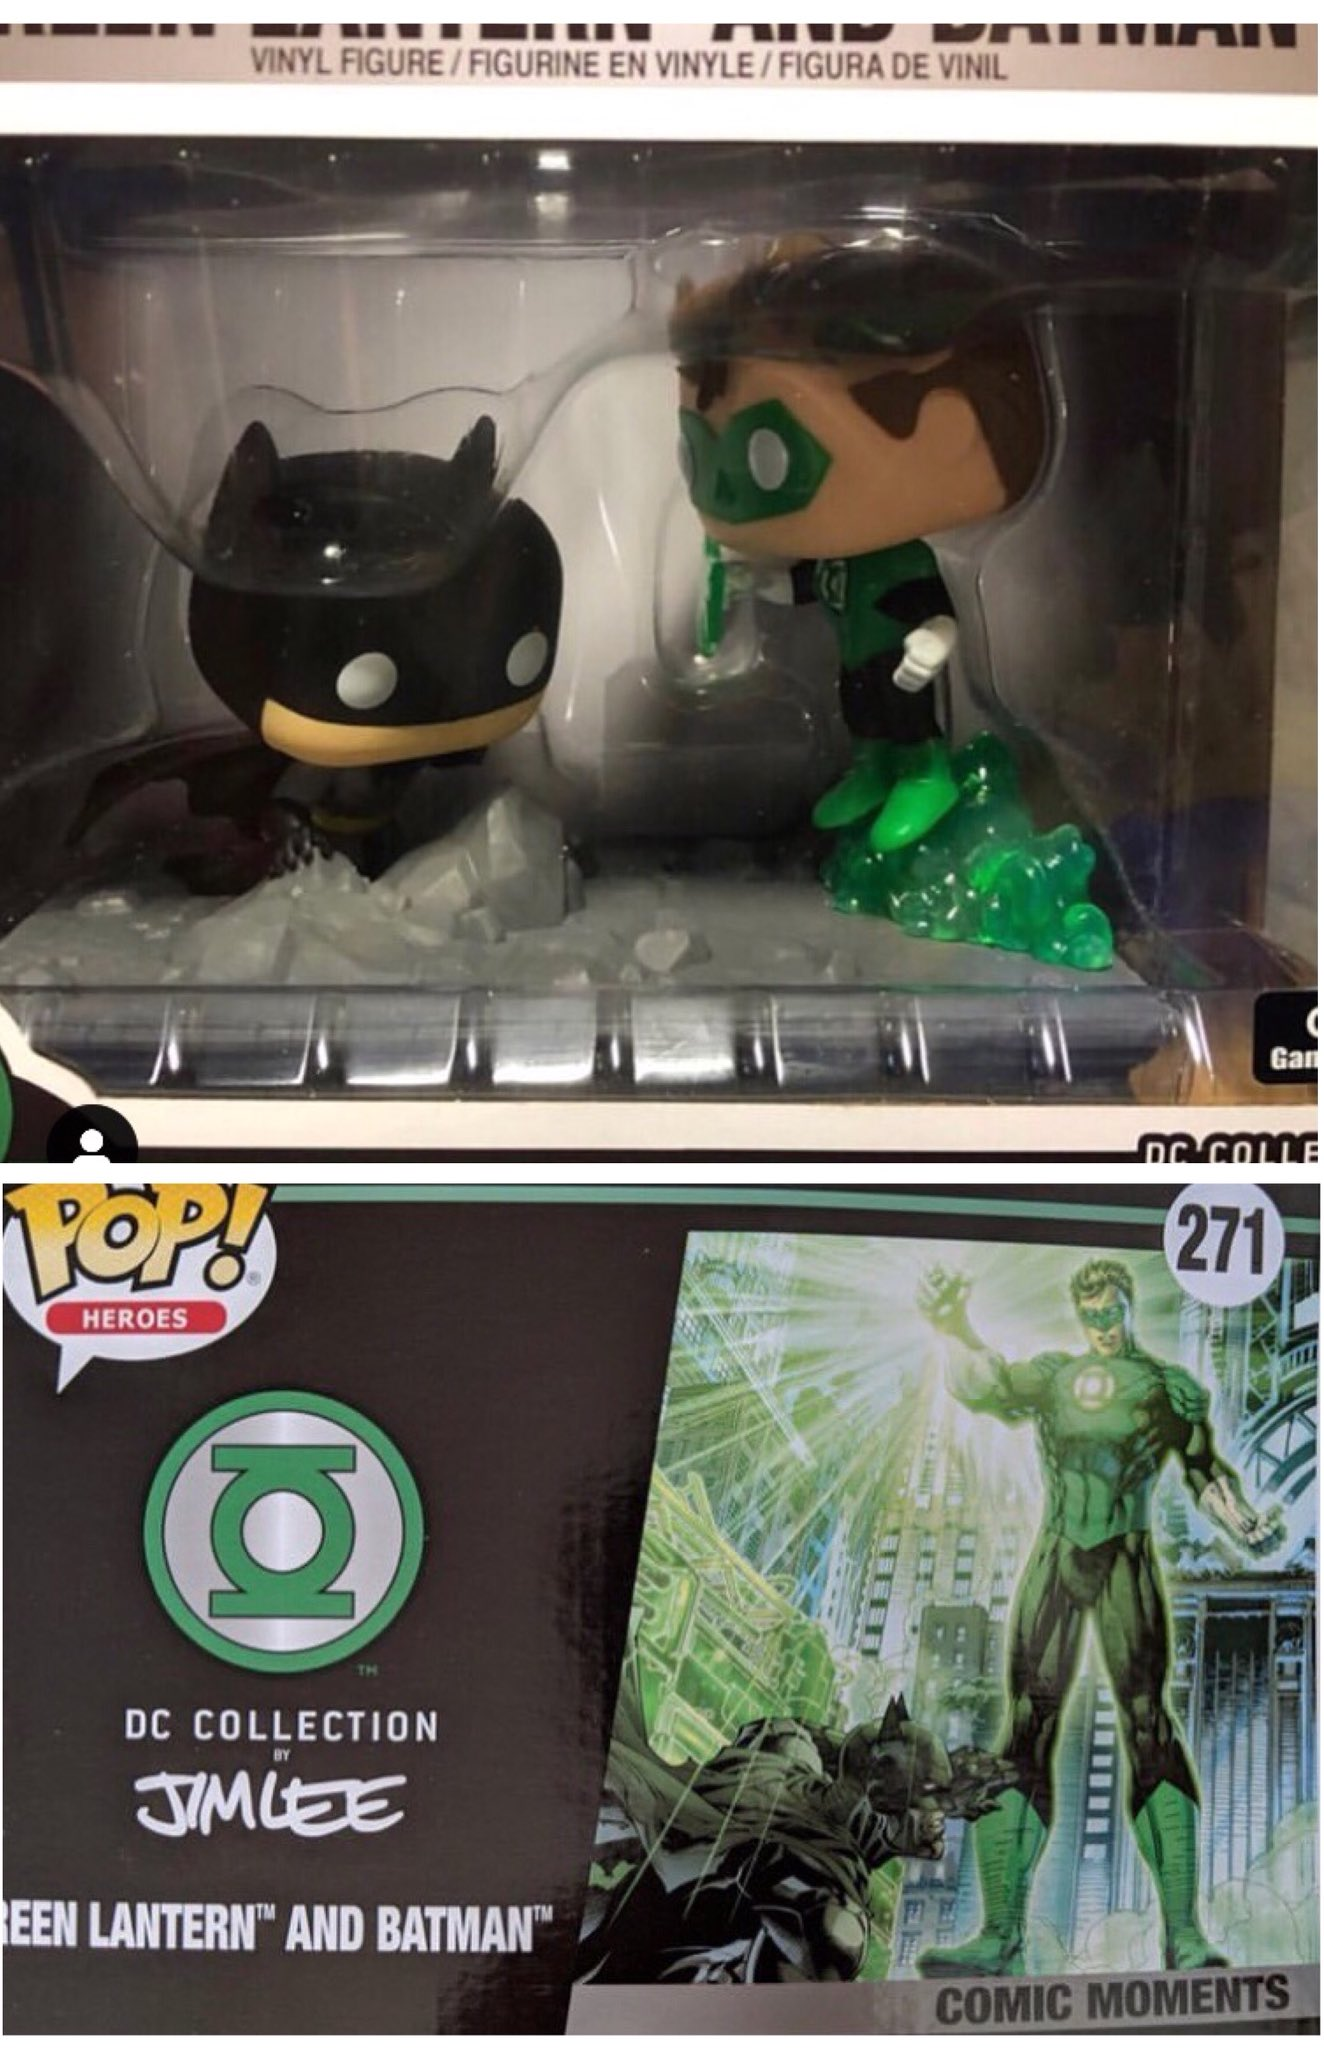 Funko Pop John Stewart Vinyl Figure Green Lantern